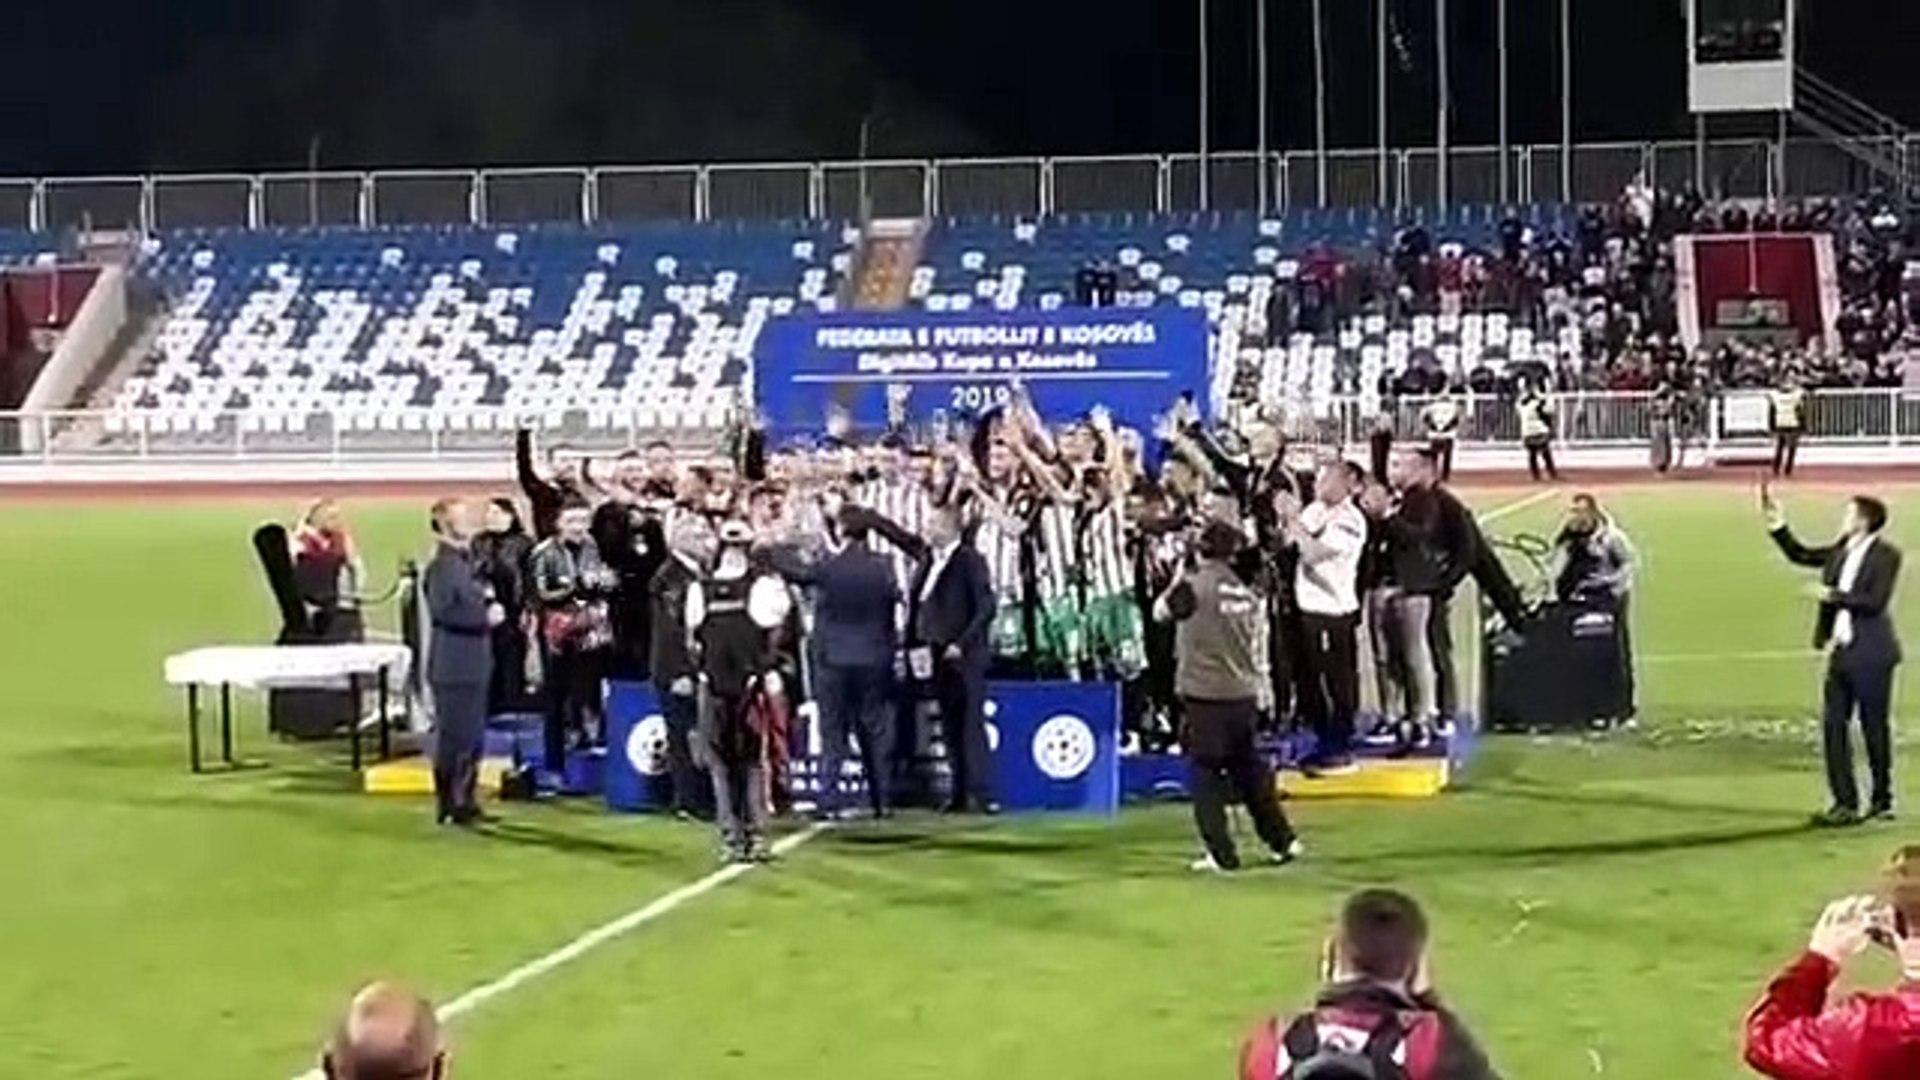 Feronikeli fitues i Kupes se Kosoves ne futboll